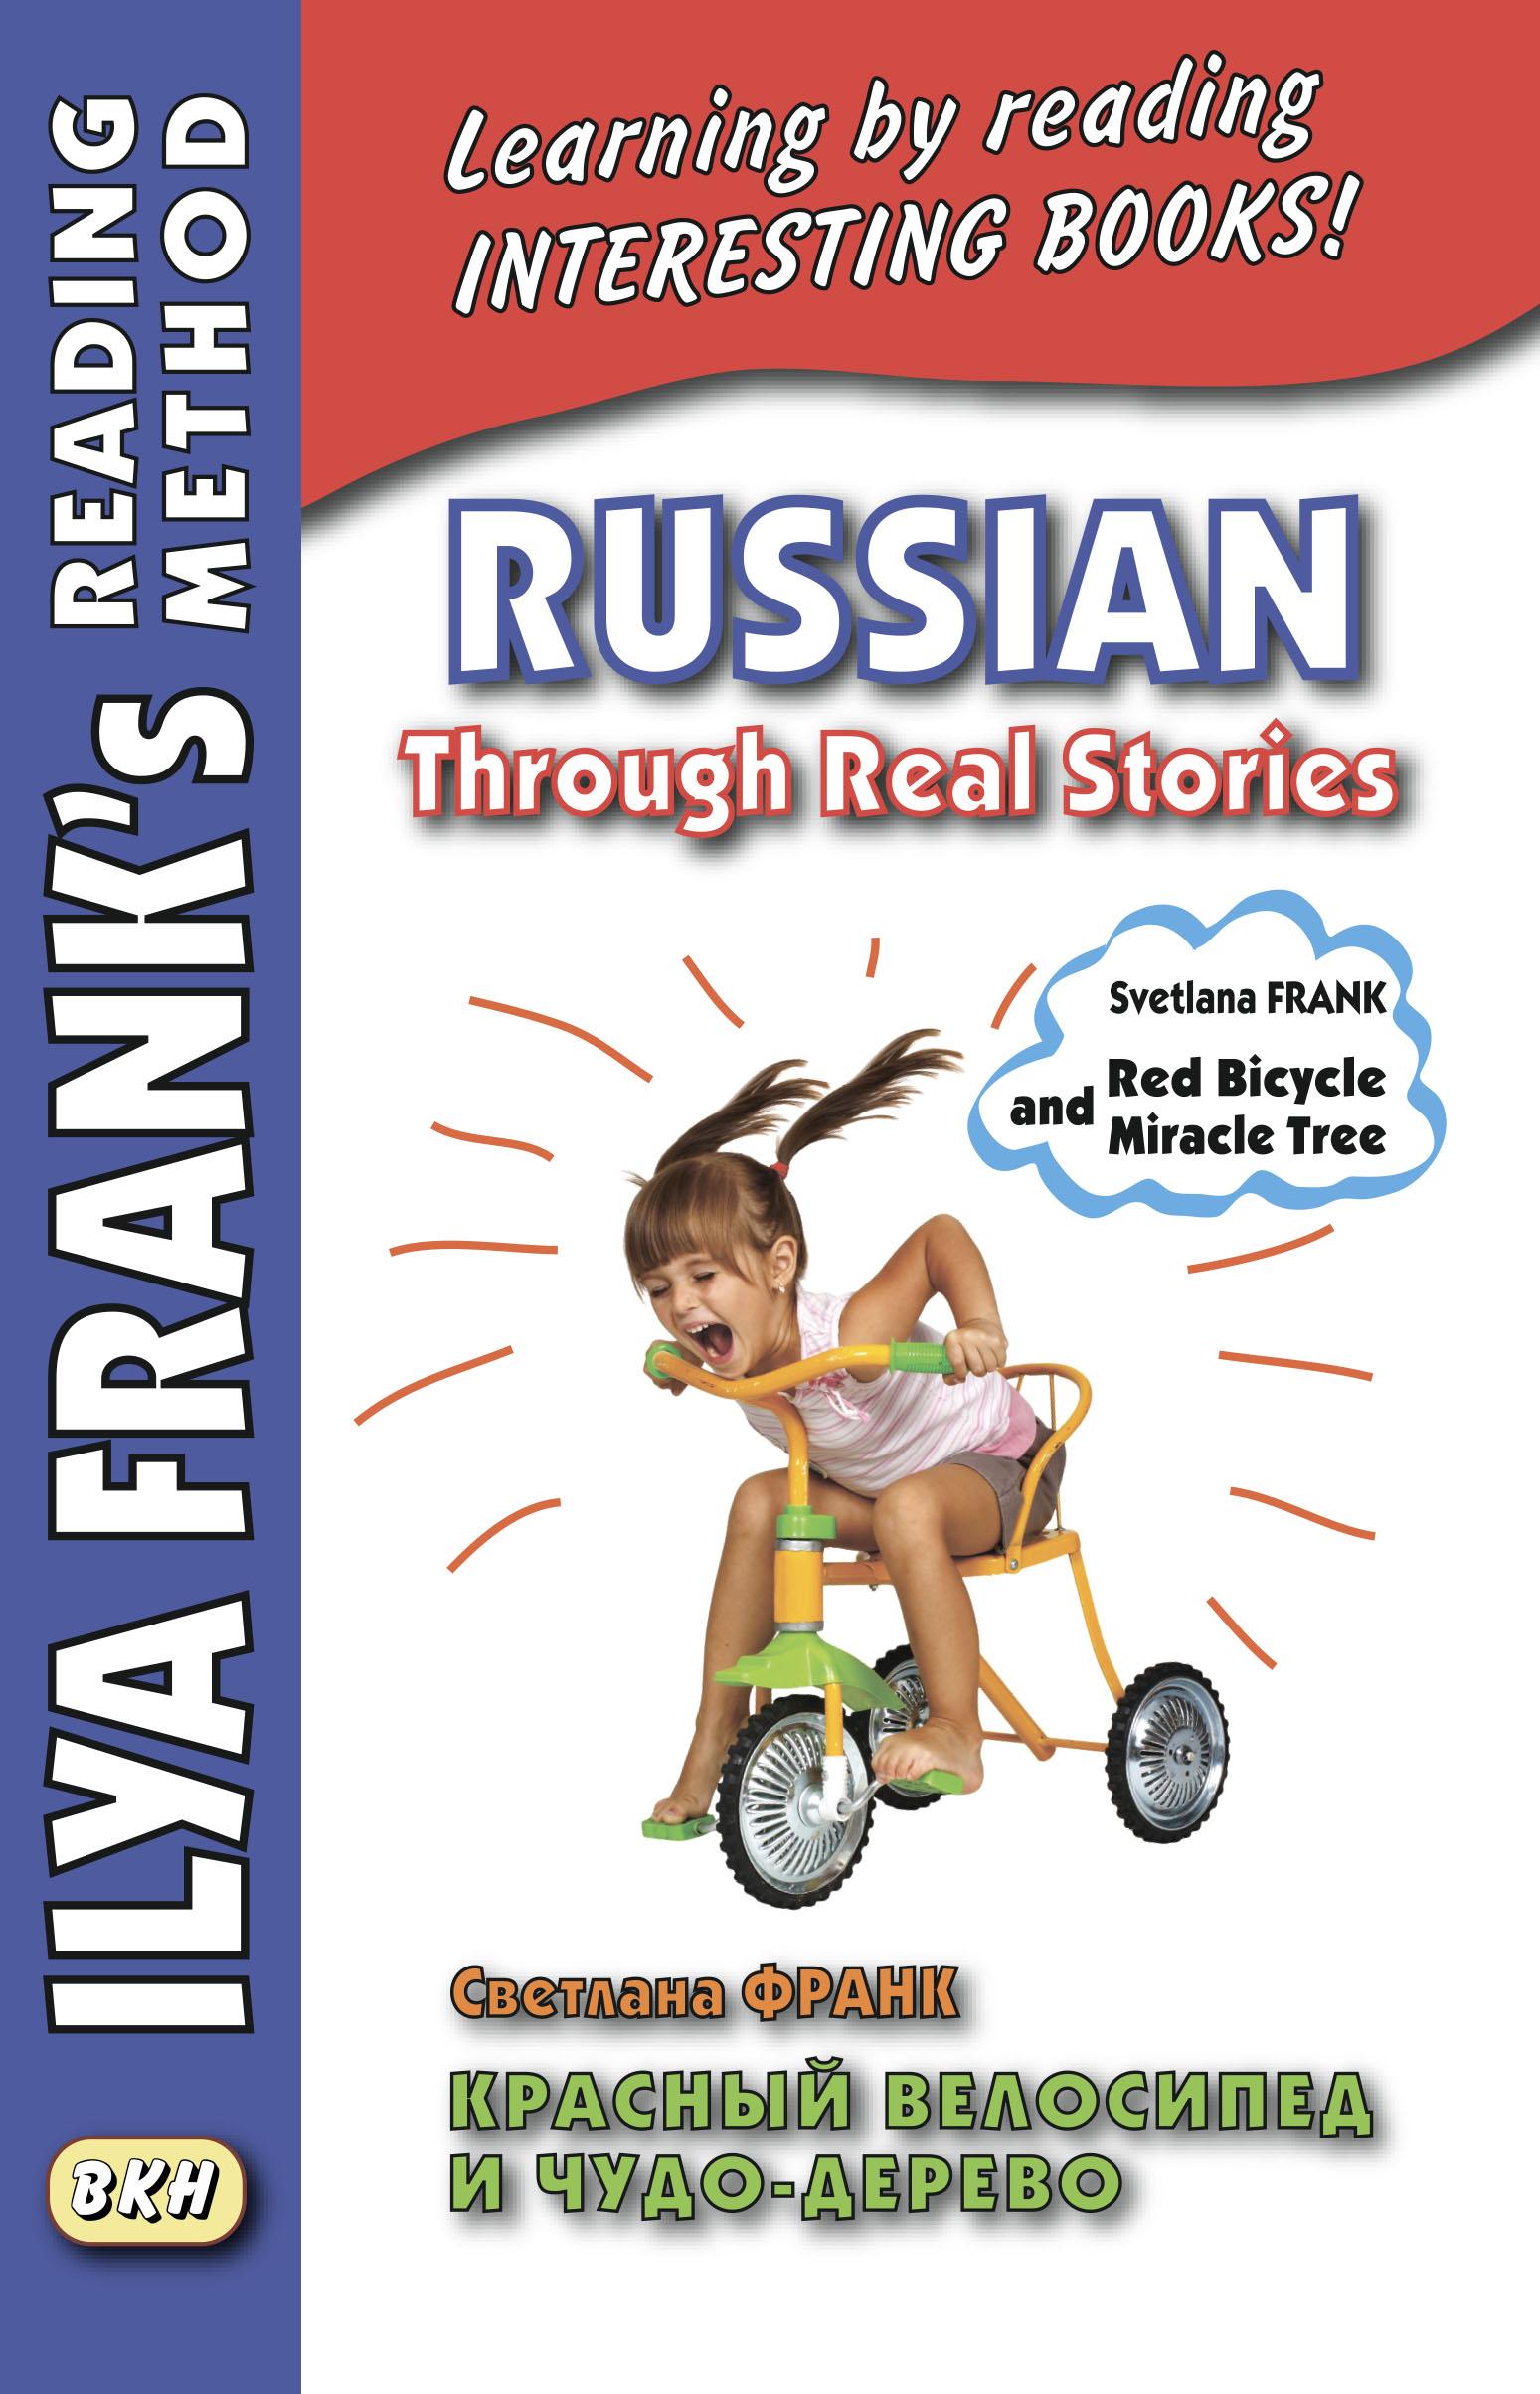 Красный велосипед и чудо-дерево \/ Russian Through Real Stories. Svetlana Frank. Red bicycle and miracle tree